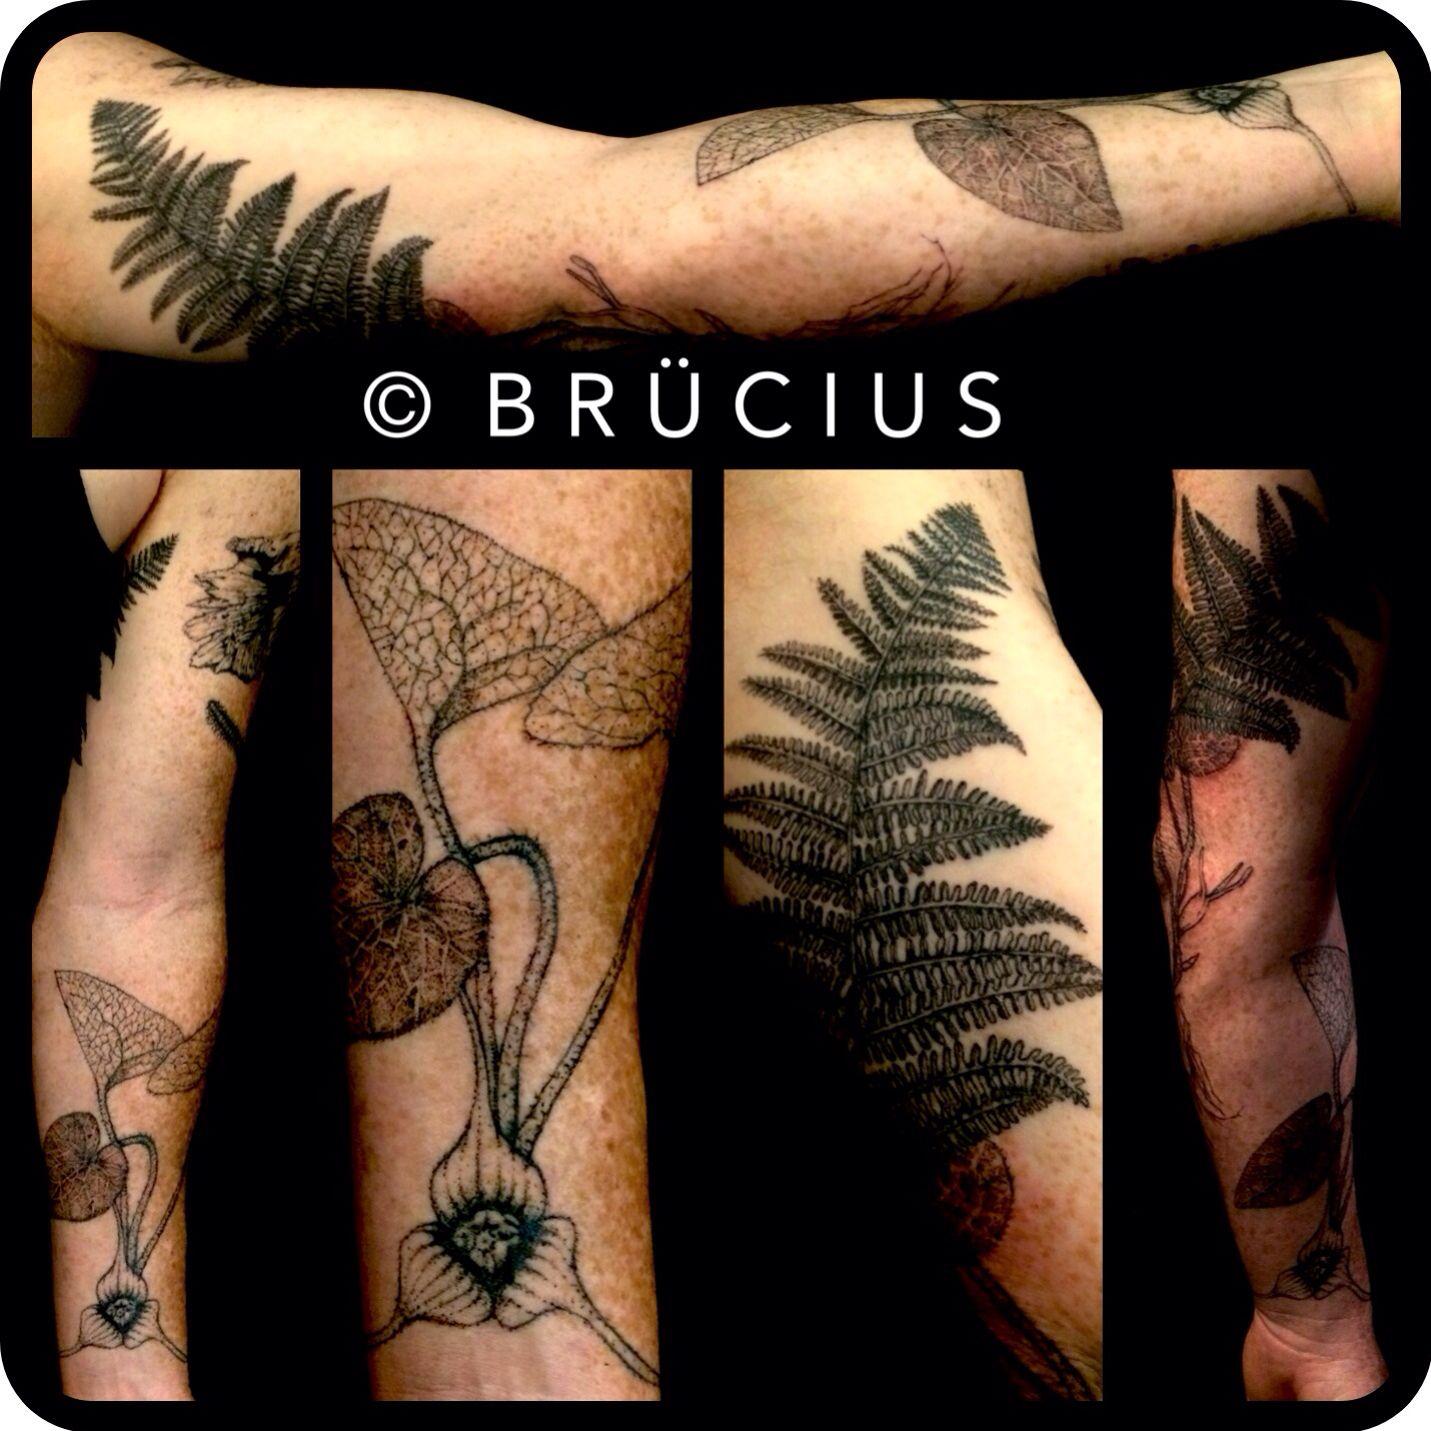 Brucius tattoo sf engraving etching stippling